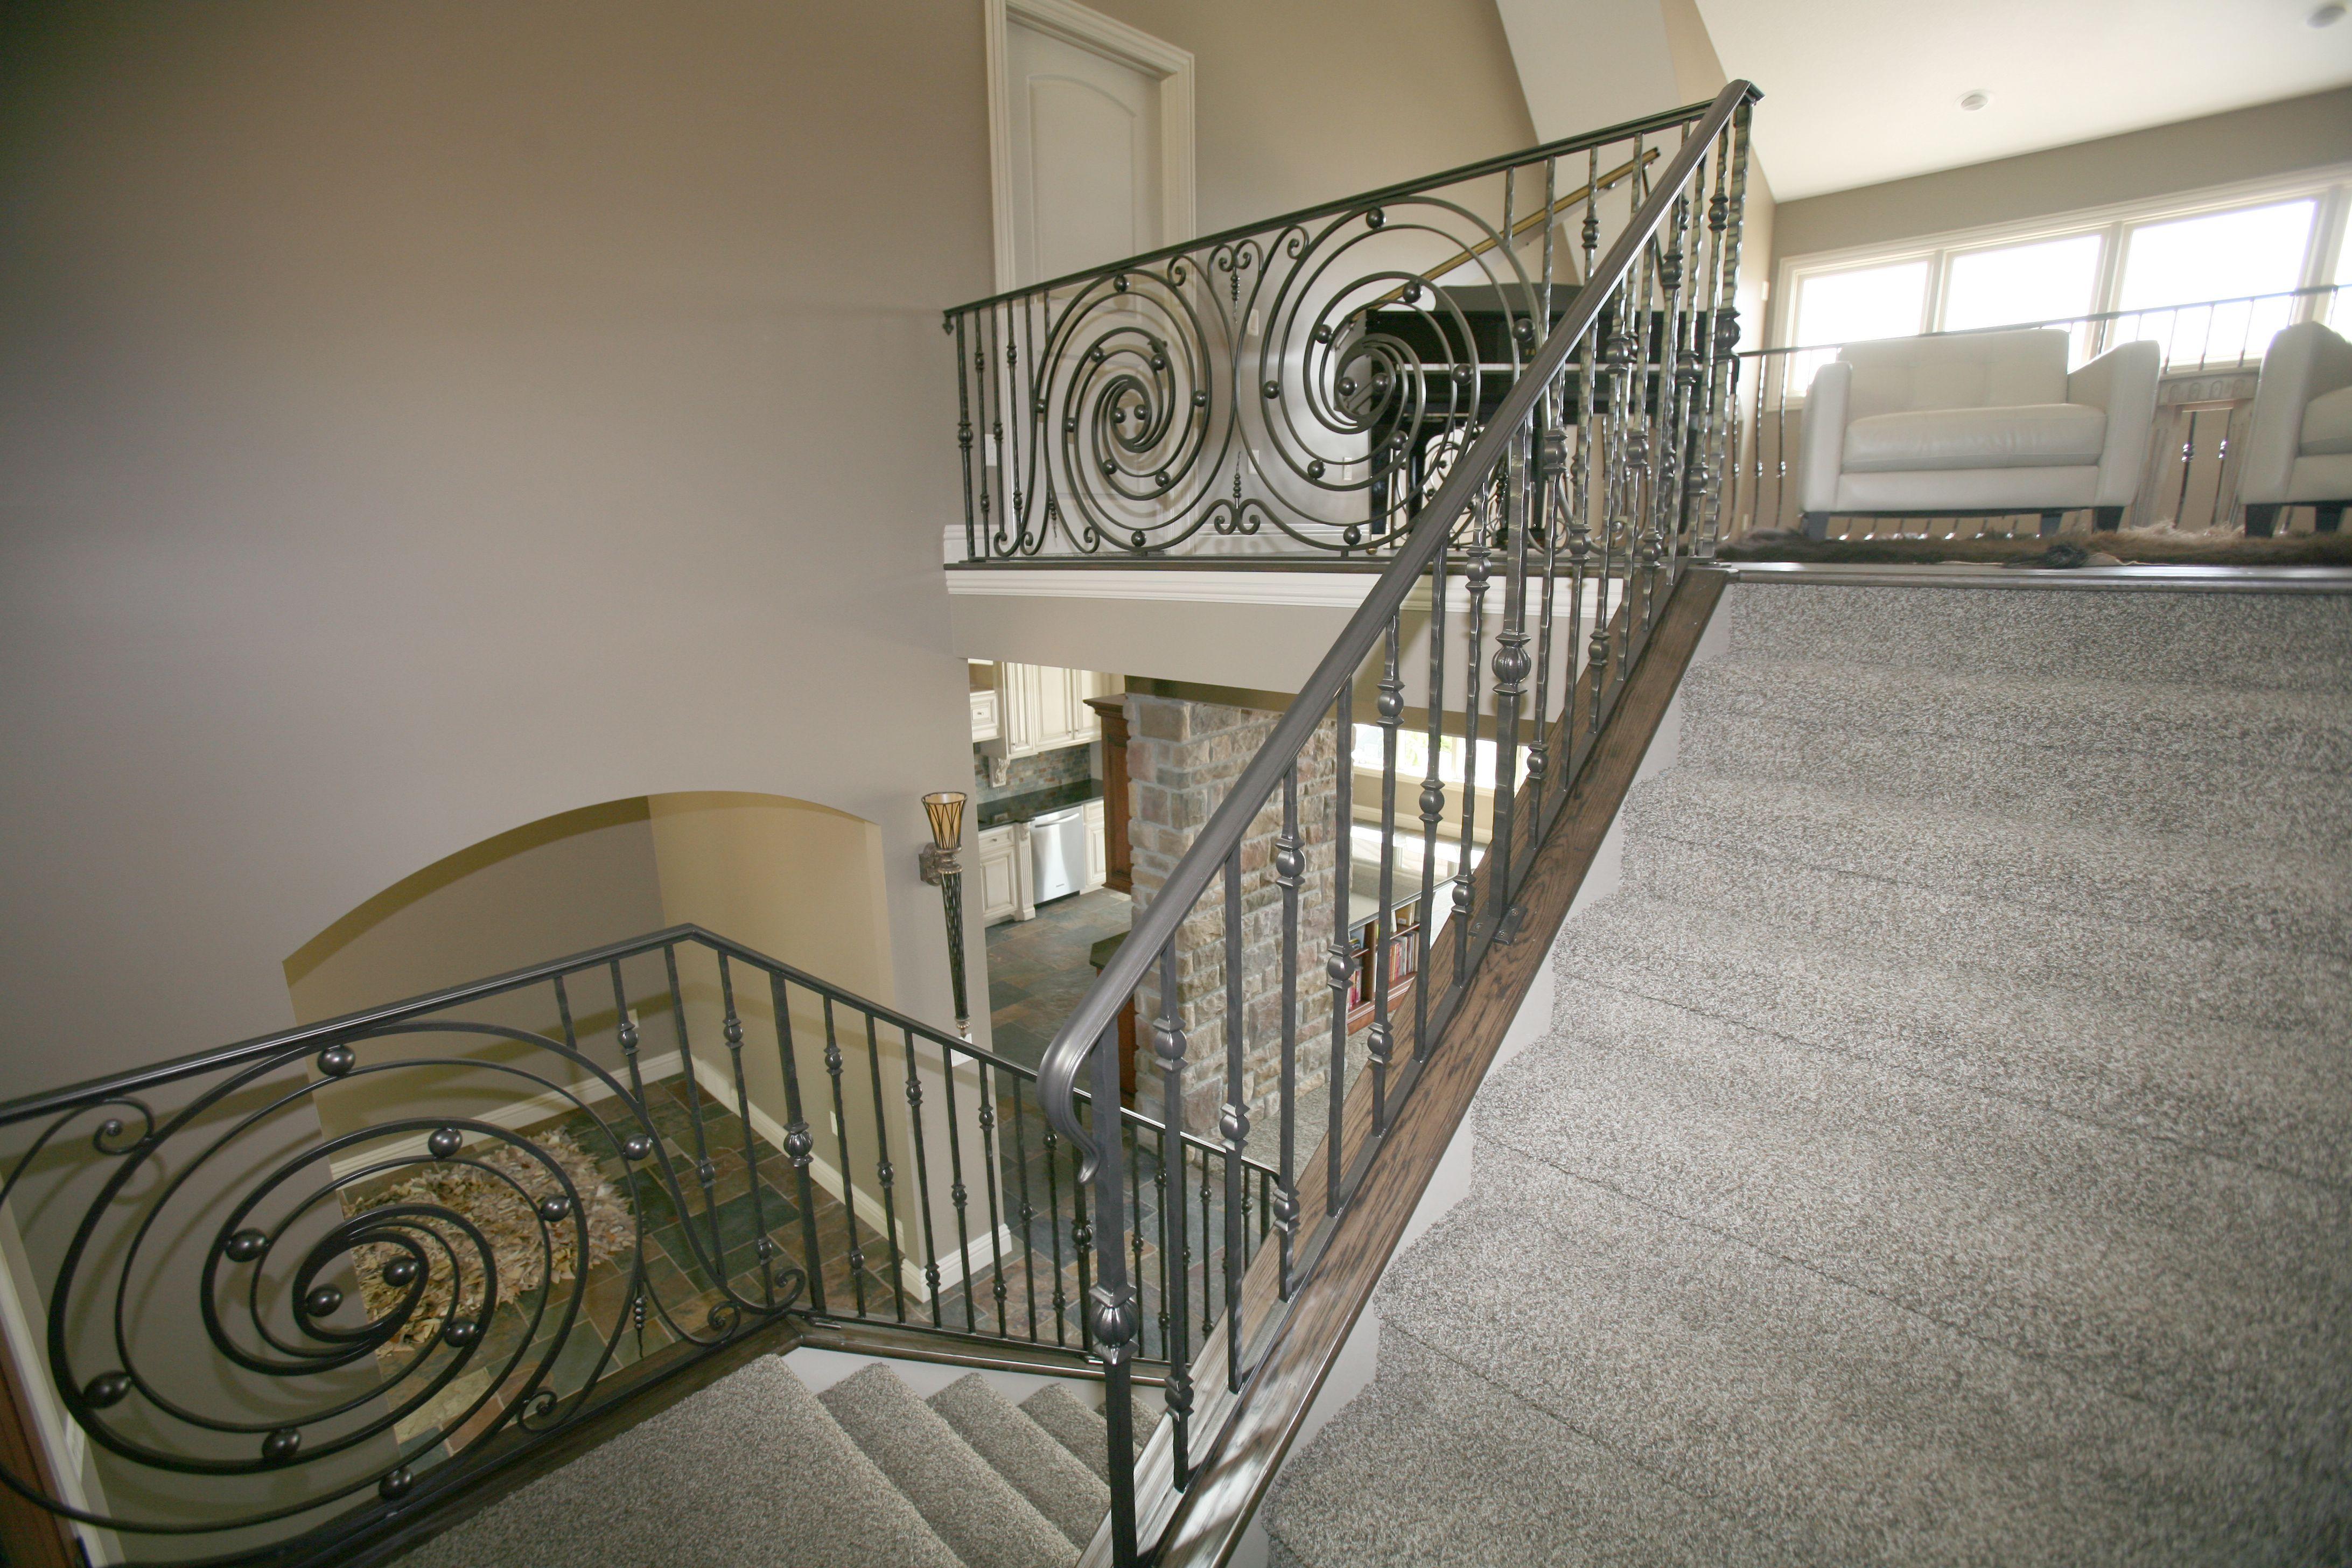 Best Powder Coat Railing With Decorative Panels Indital Usa Coat Rail Stair Railing Decorative 640 x 480